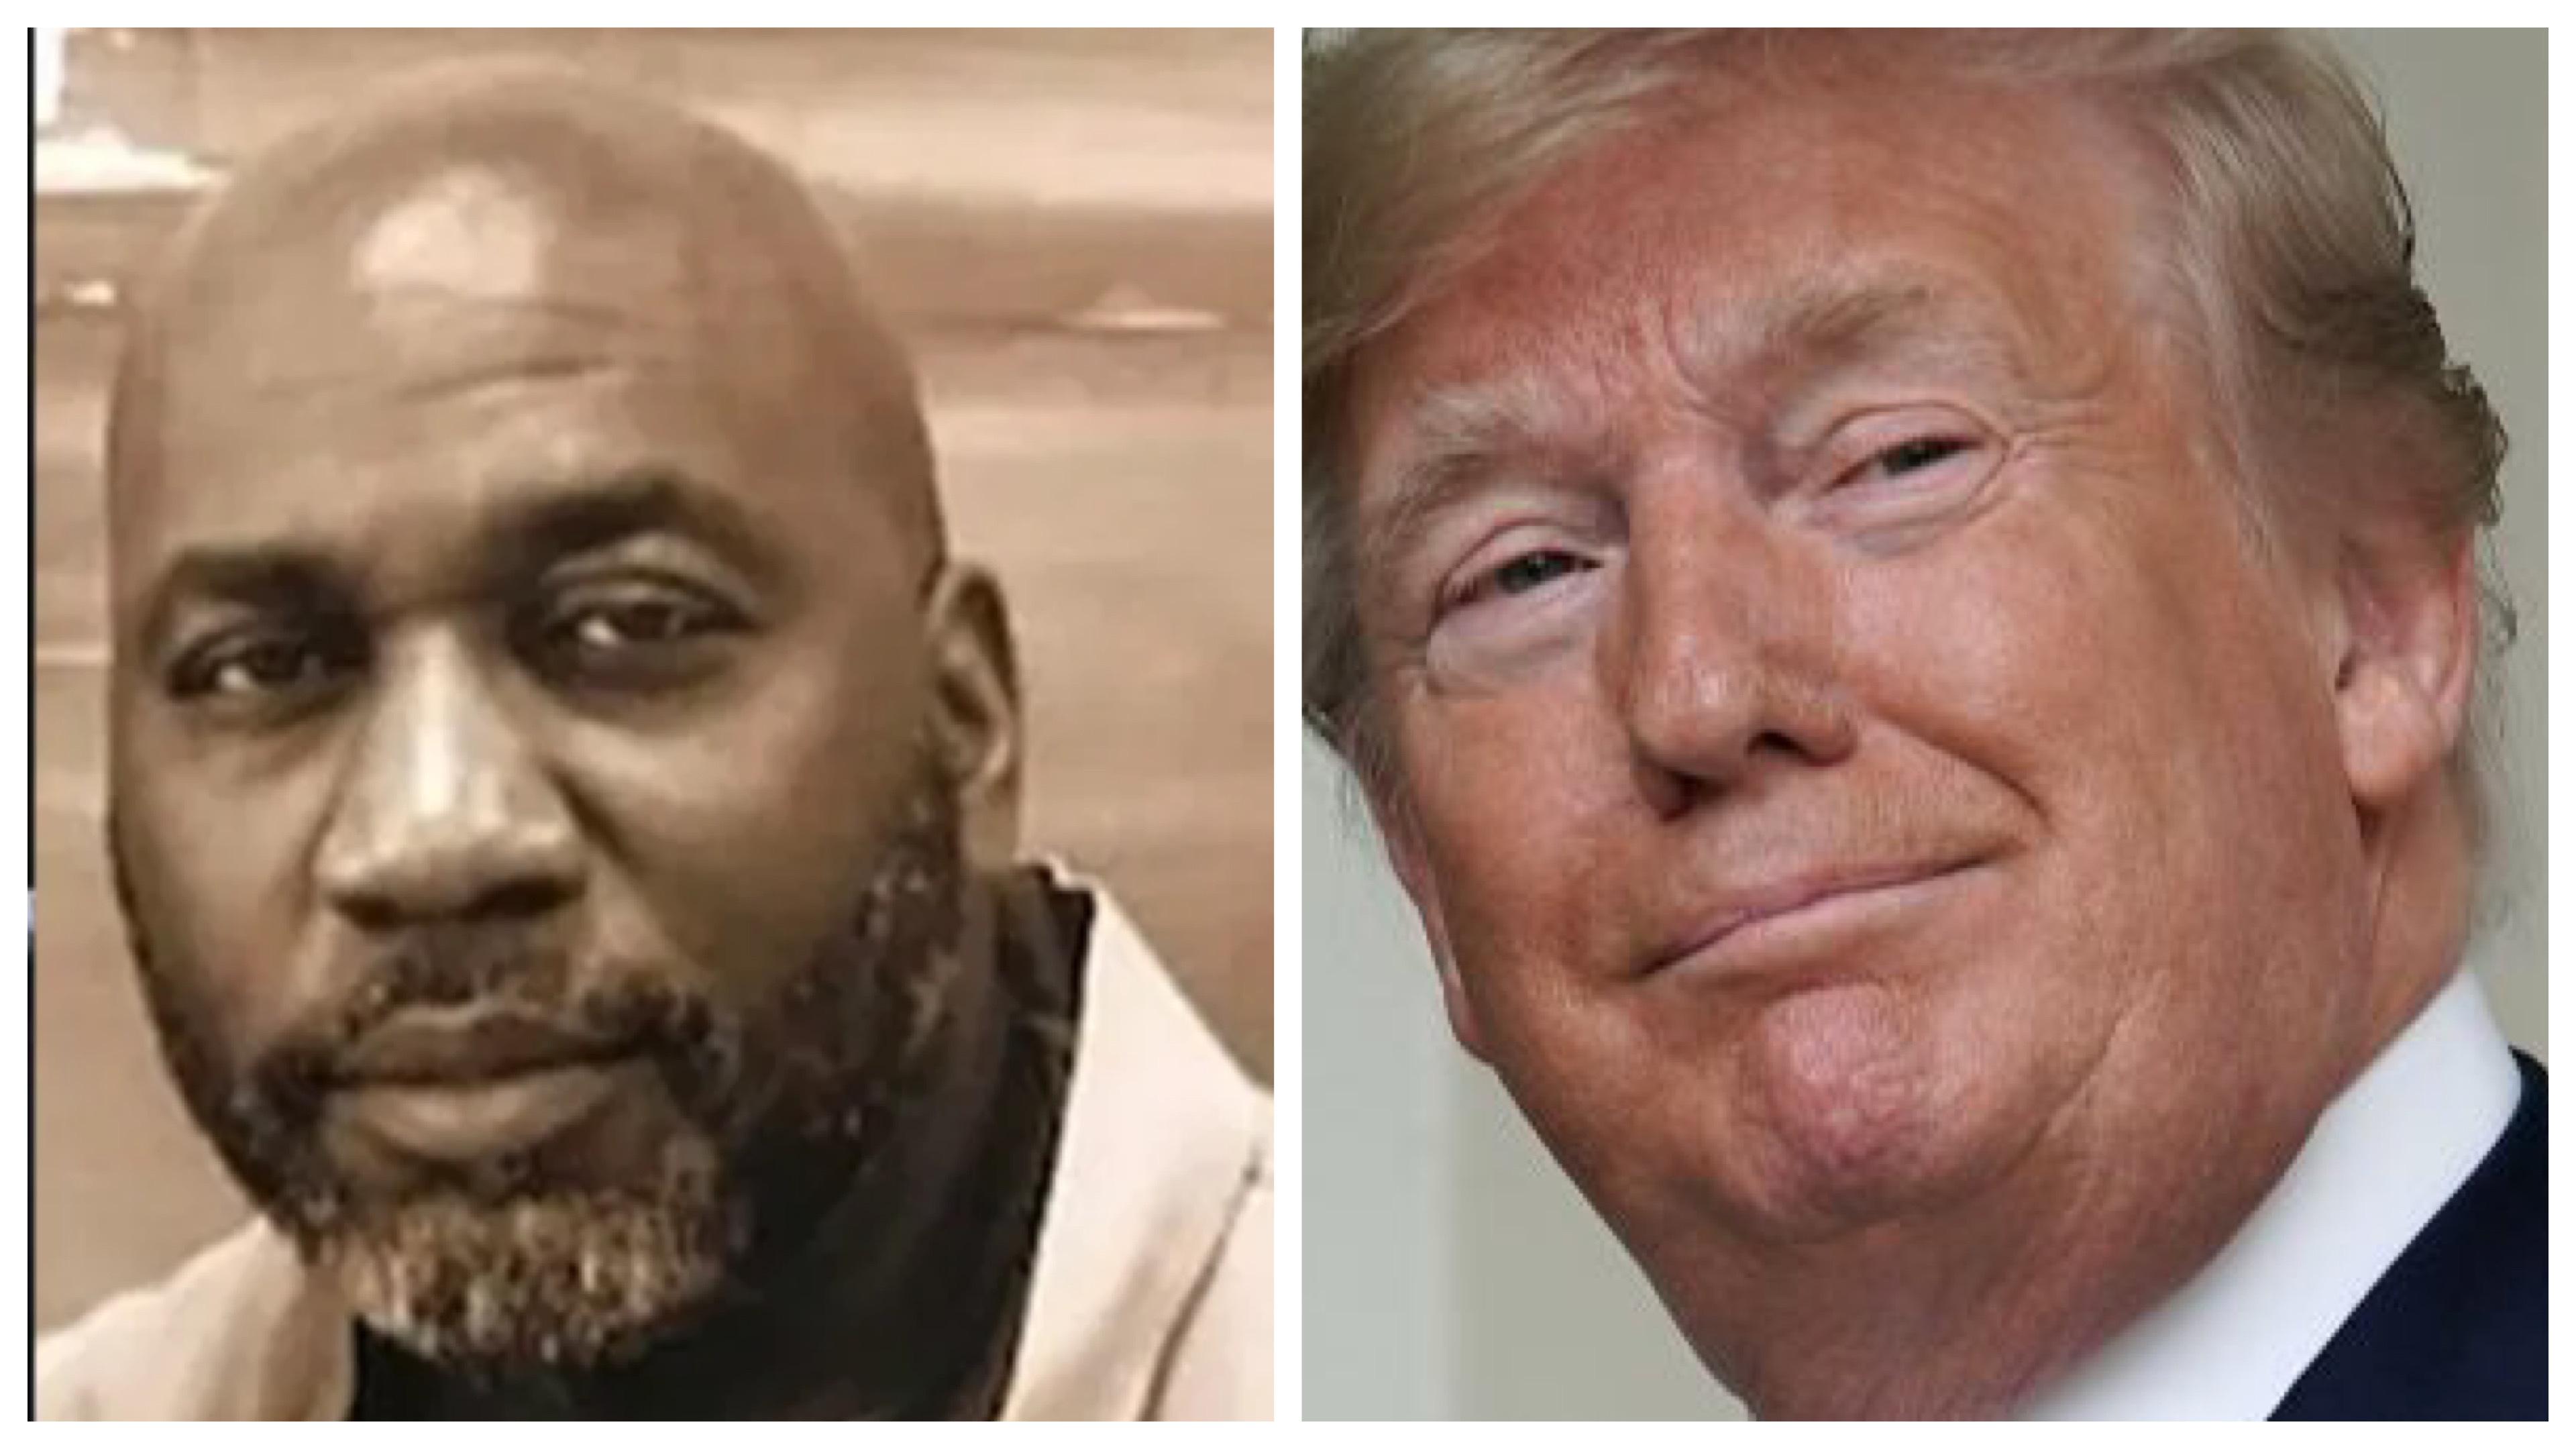 Michael Harris and Donald Trump